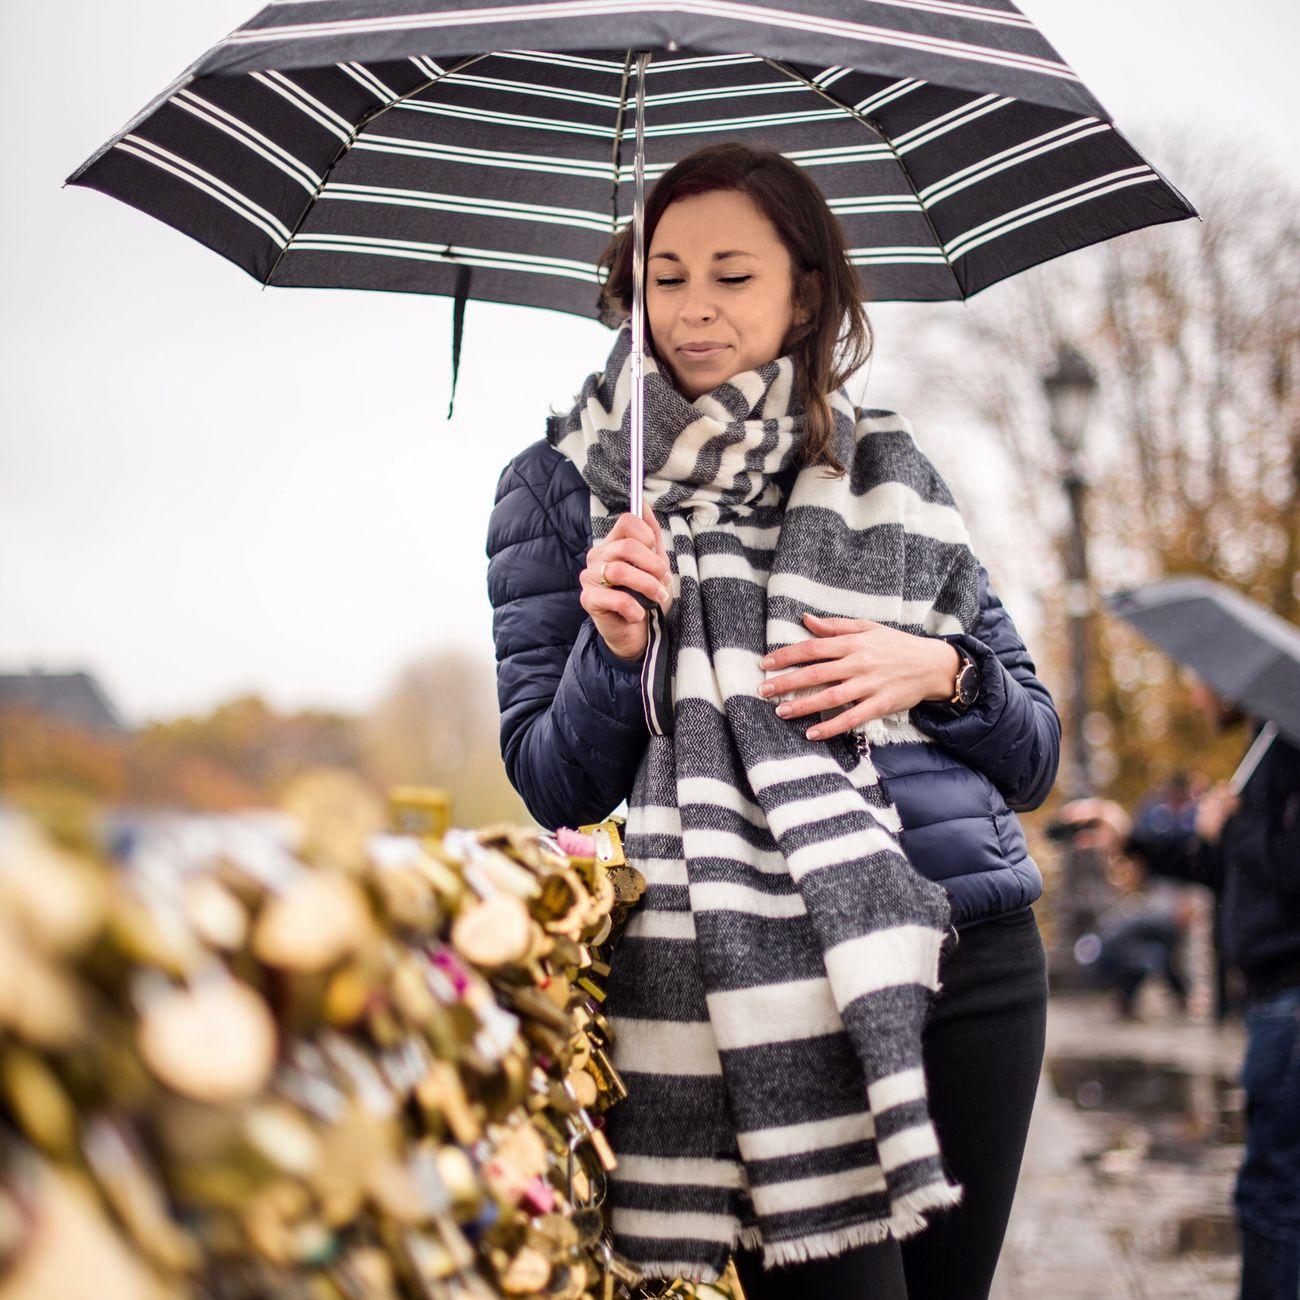 Rainy days in Paris with Charlotte! Bonsoir Paris! Rain Weather Striped Beautiful People Women Photooftheday EyeEm Best Shots Paris Parisweloveyou Smiling Paris ❤